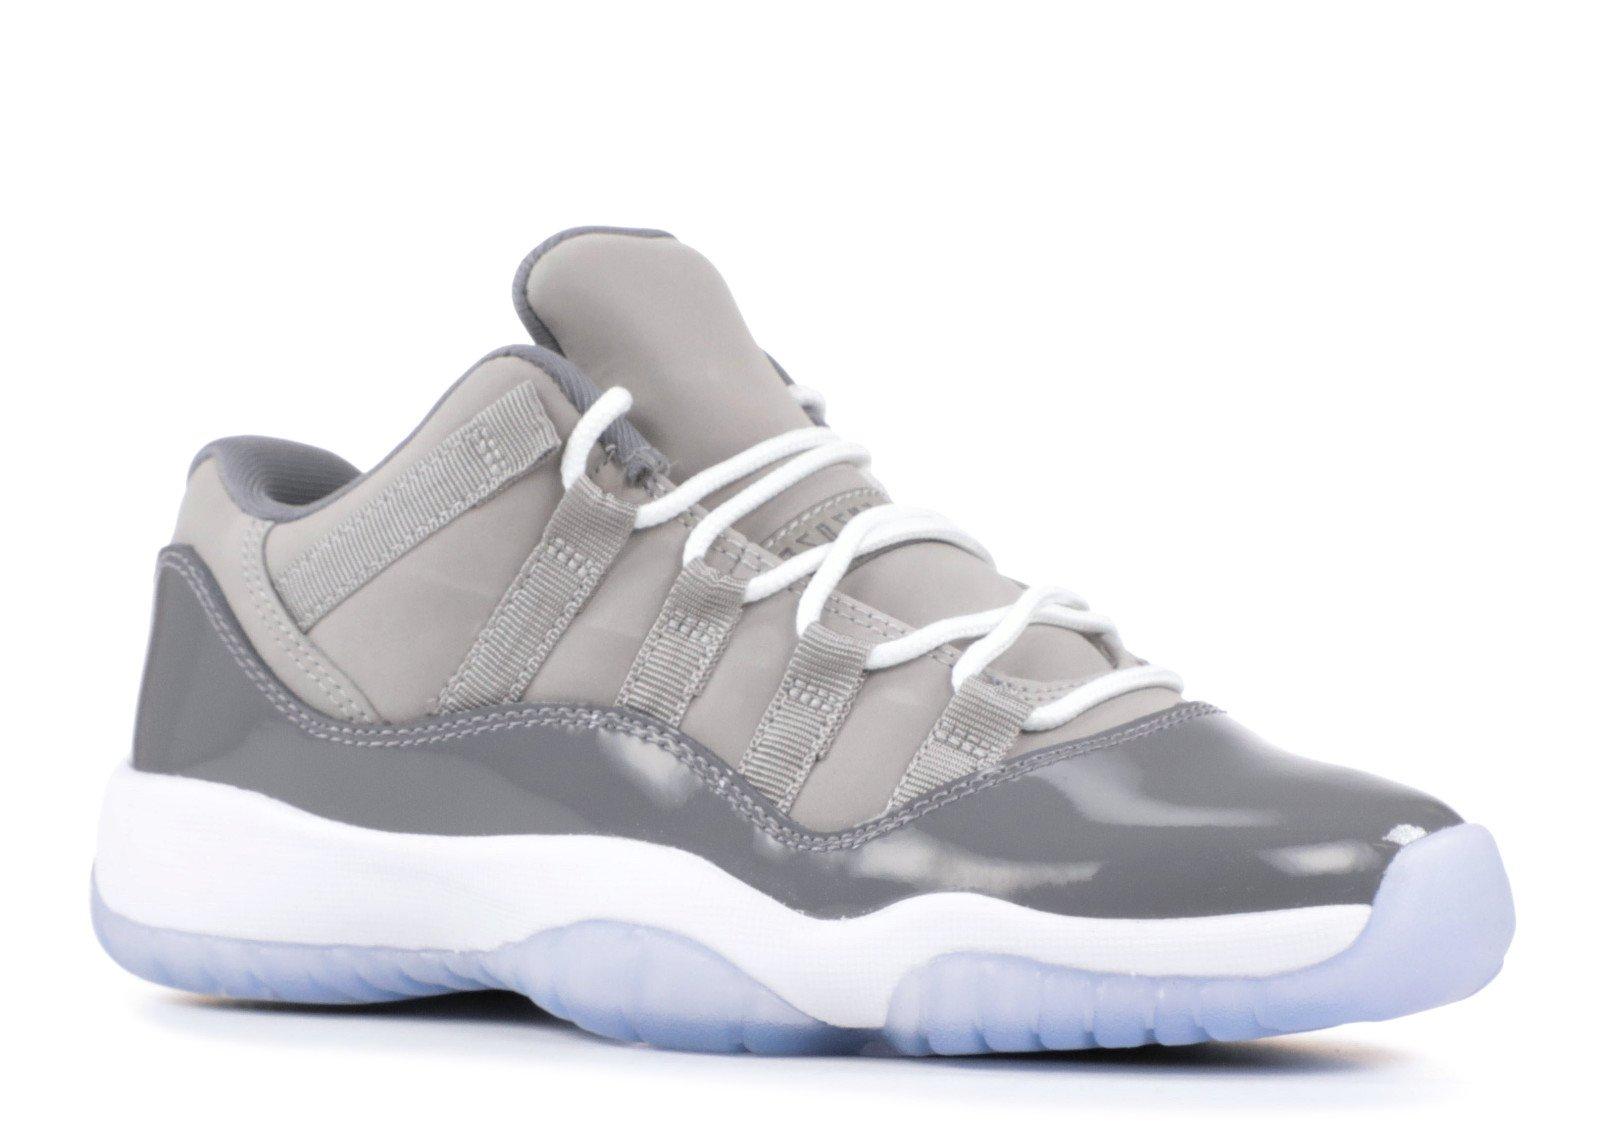 Jordan Nike 11 Retro Low Cool Grey Boys/Girls Style: 528896-003 Size: 5.5